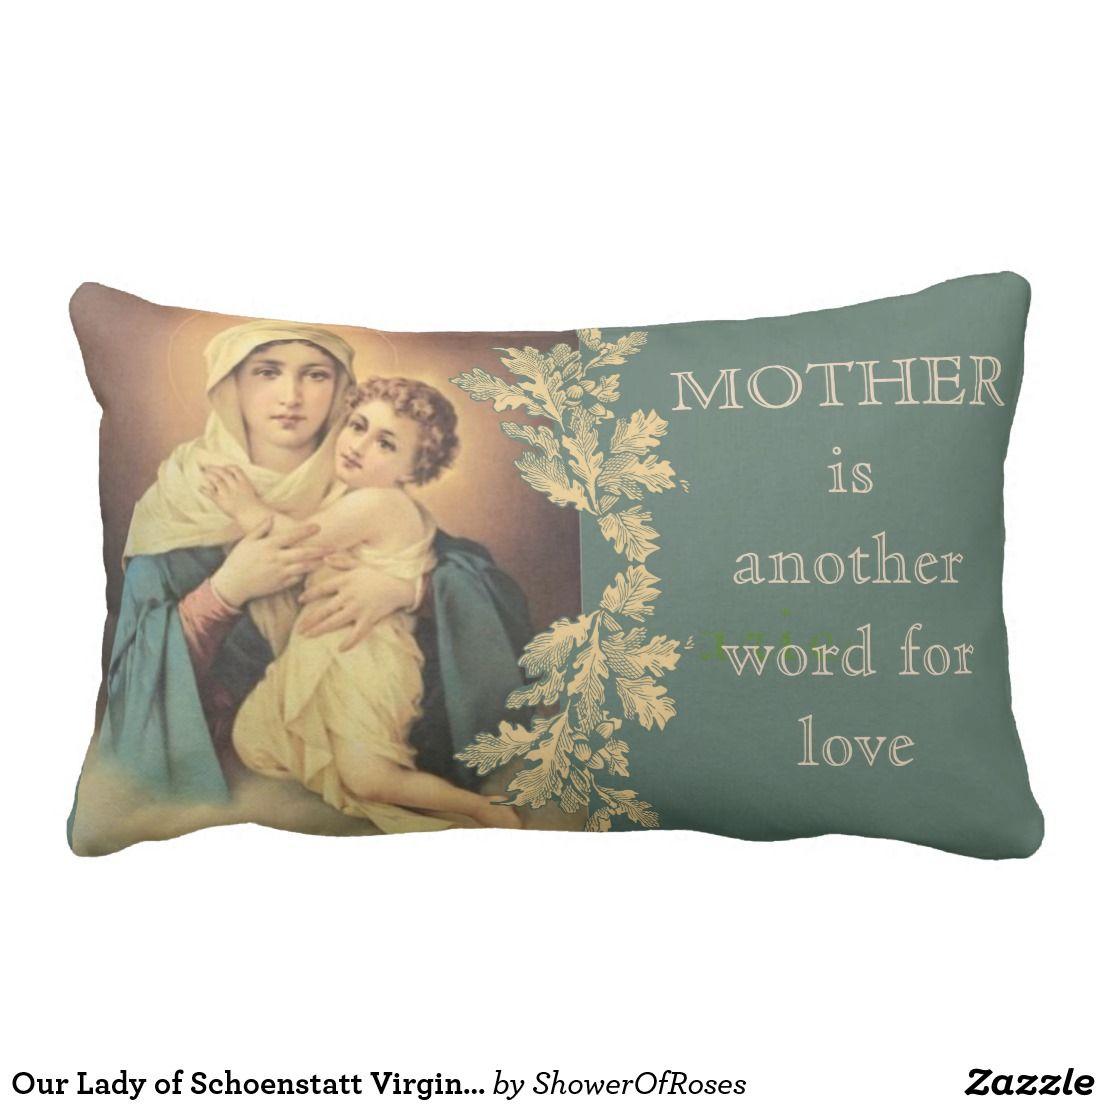 Our Lady of Schoenstatt Virgin Mary Jesus MOTHER Lumbar Pillow